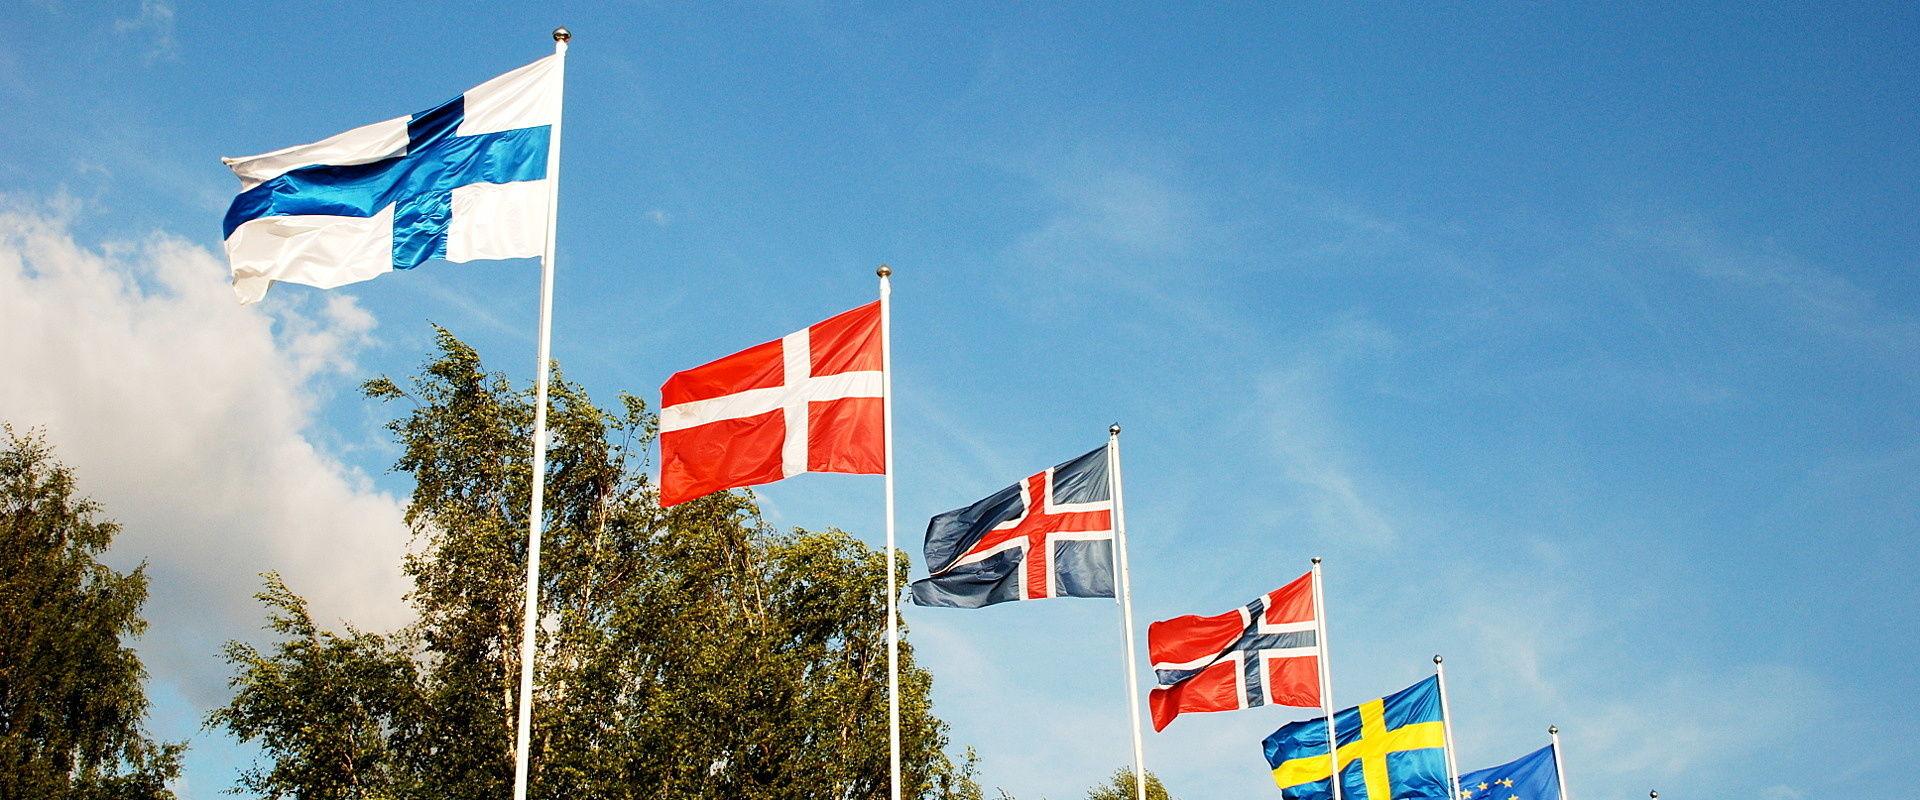 Flags of Scandinavia